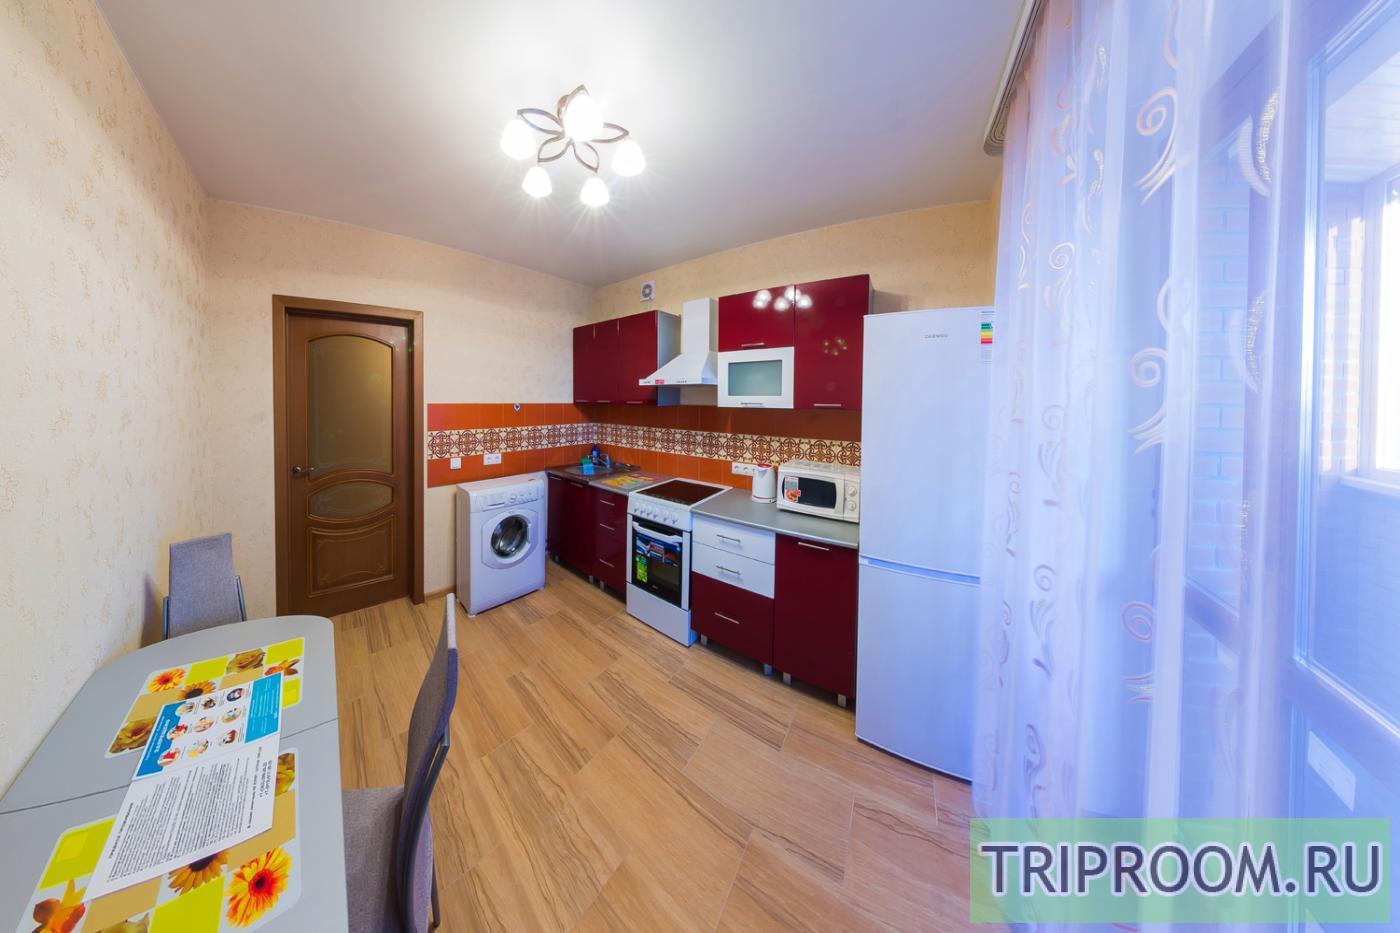 1-комнатная квартира посуточно (вариант № 17182), ул. Костычева улица, фото № 3